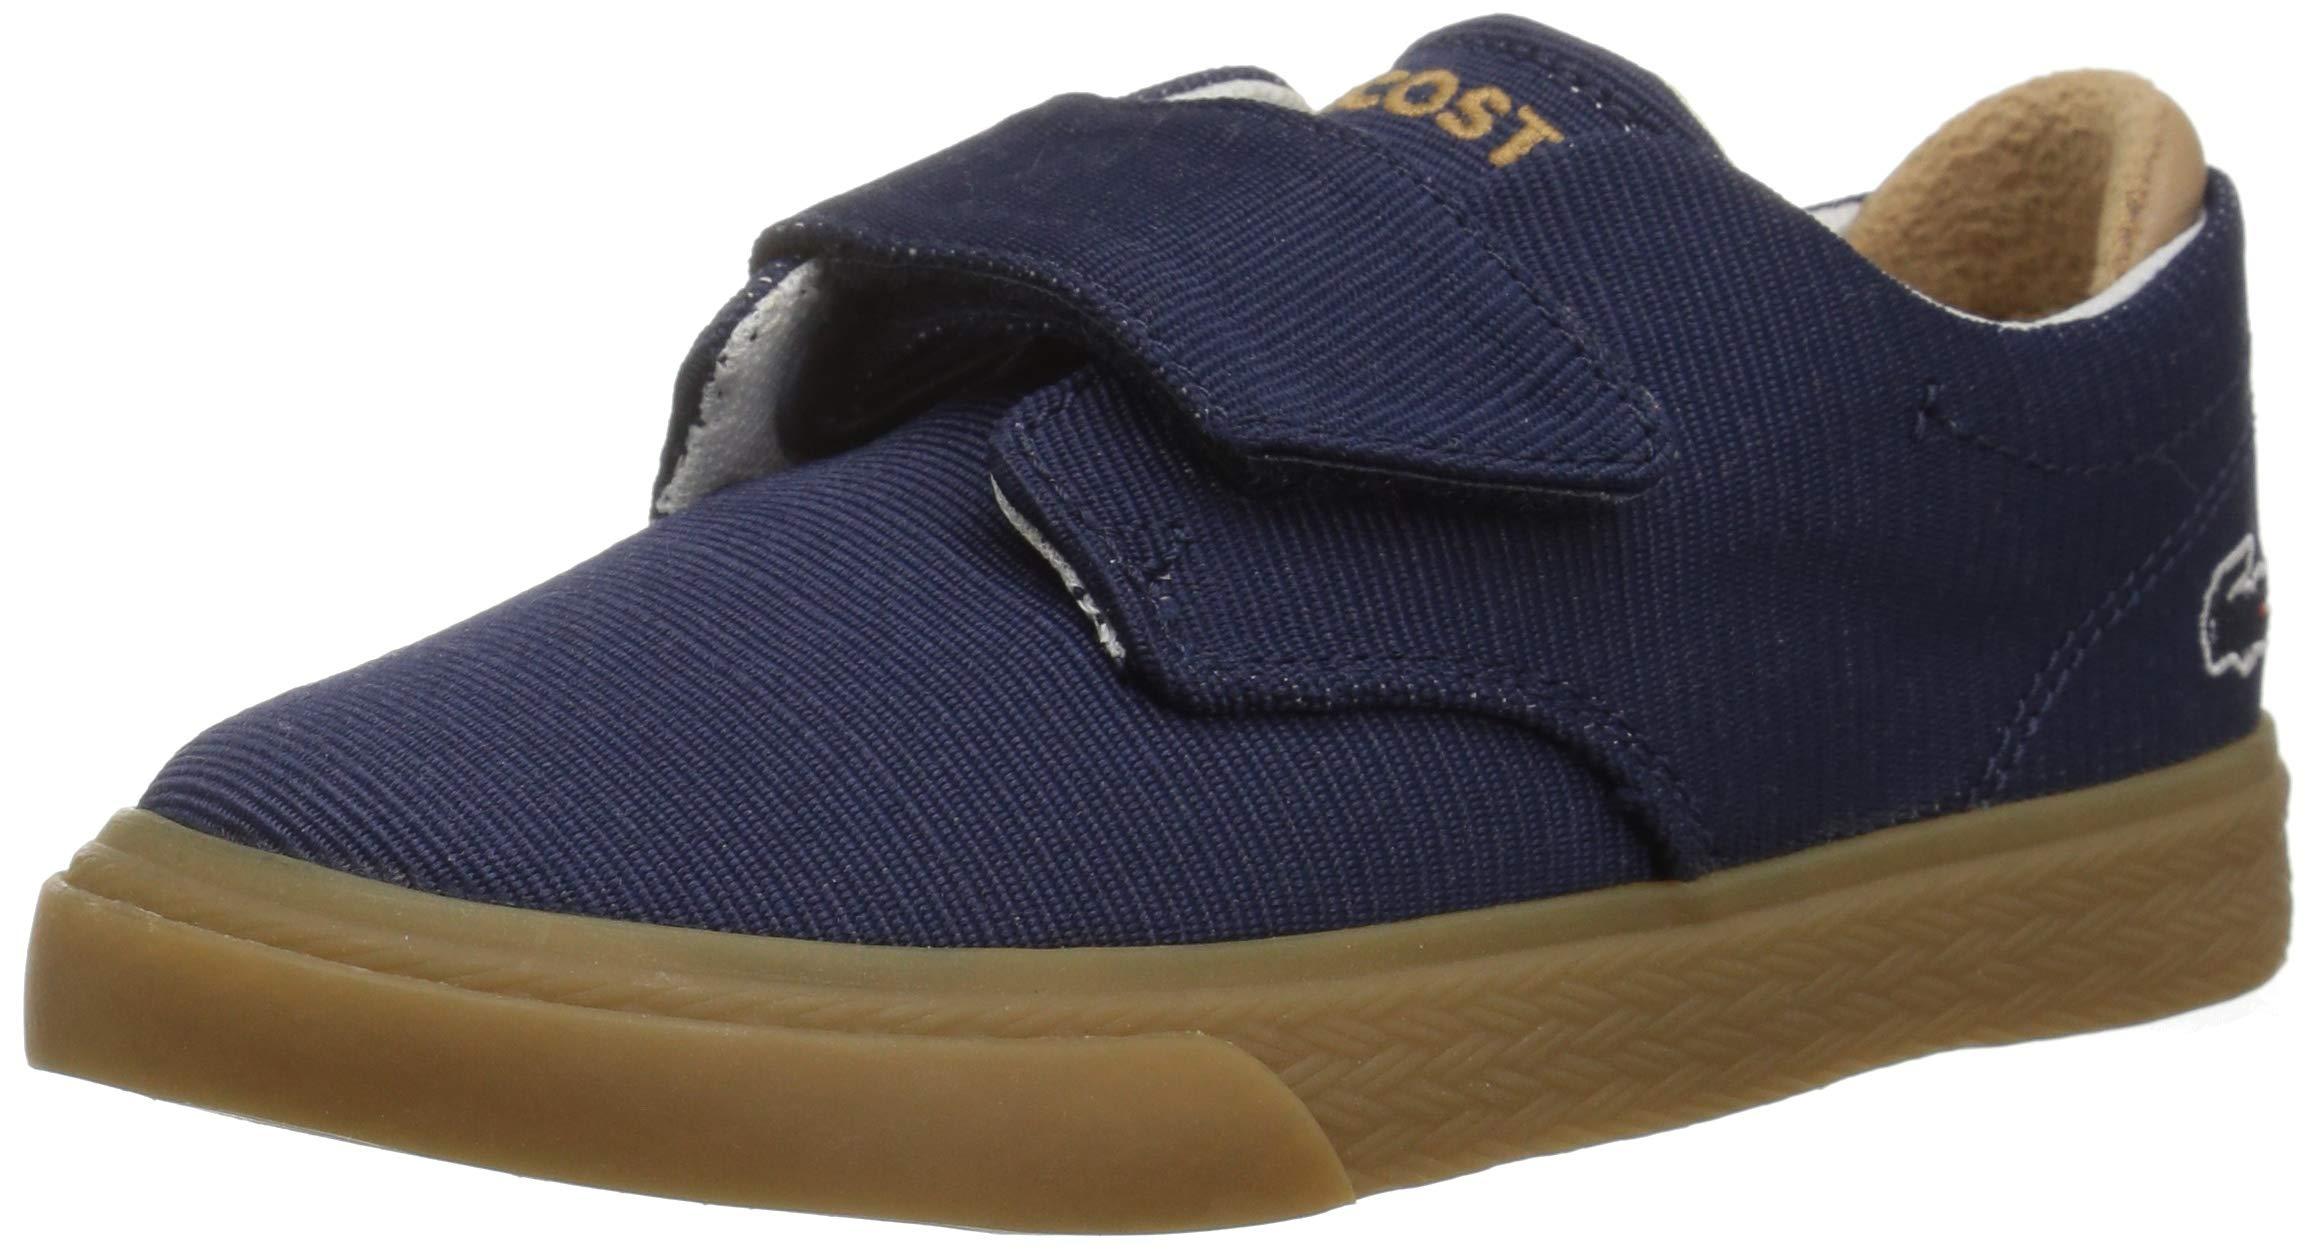 Lacoste Baby ESPARRE Sneaker, navy/light